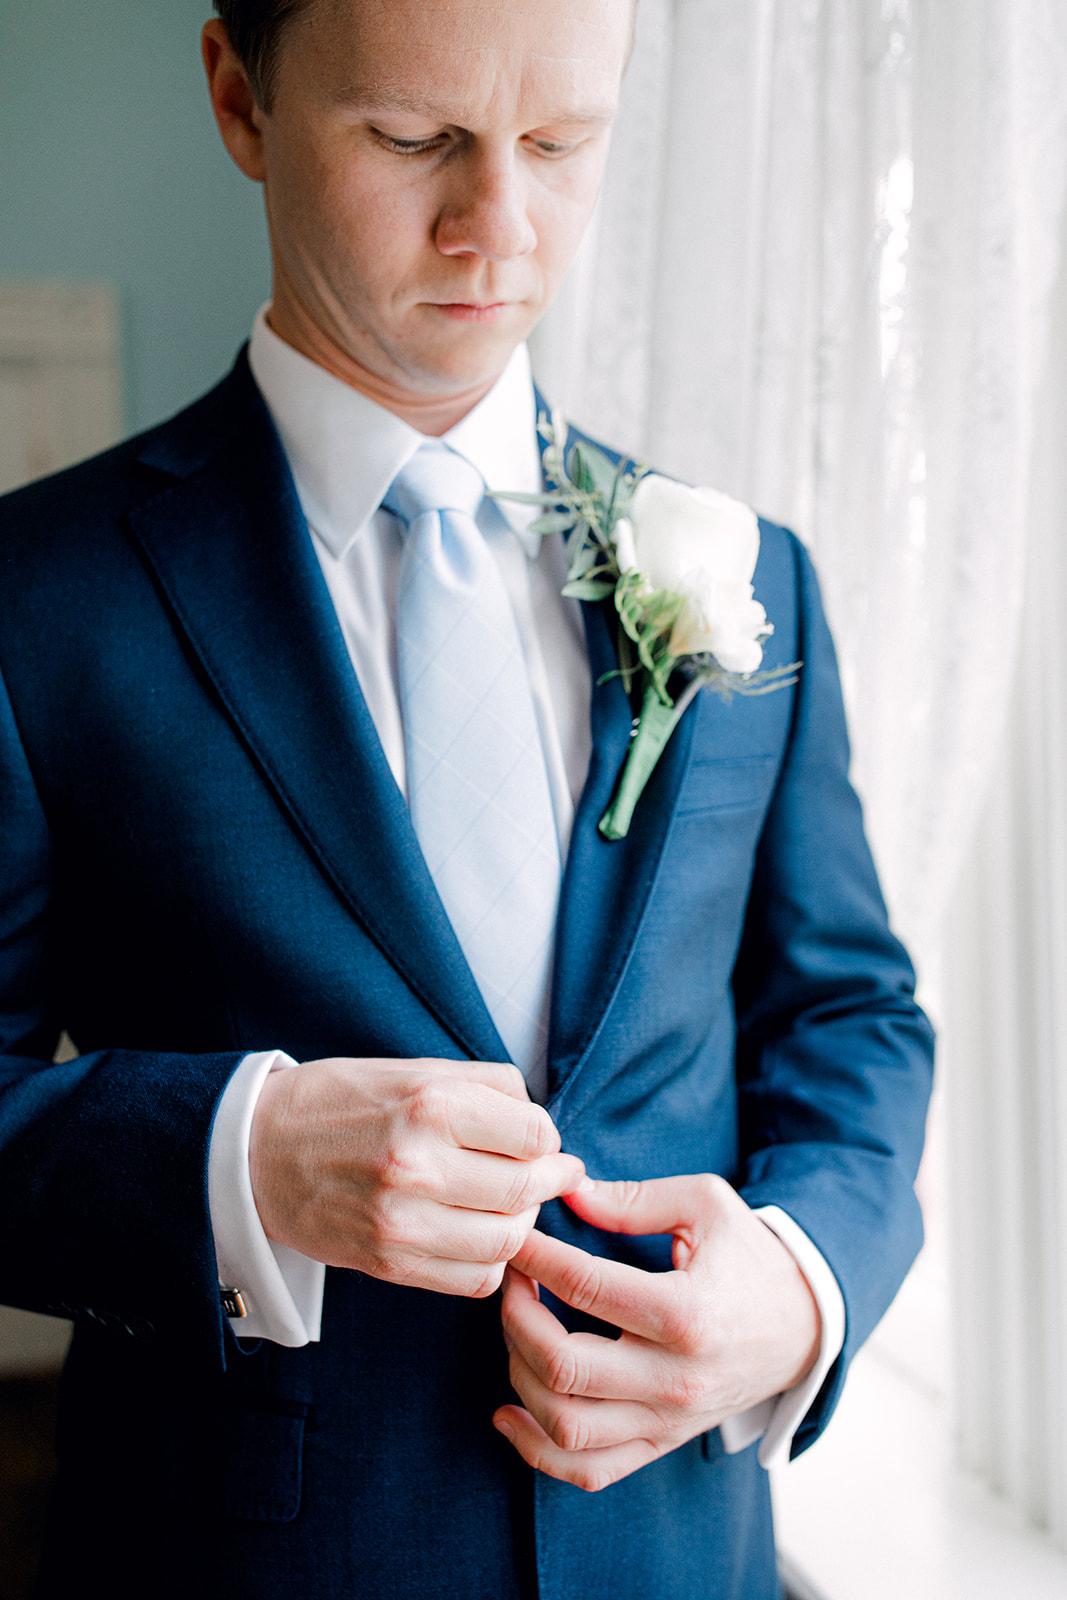 Blue wedding tuxedo with white wedding boutonniere